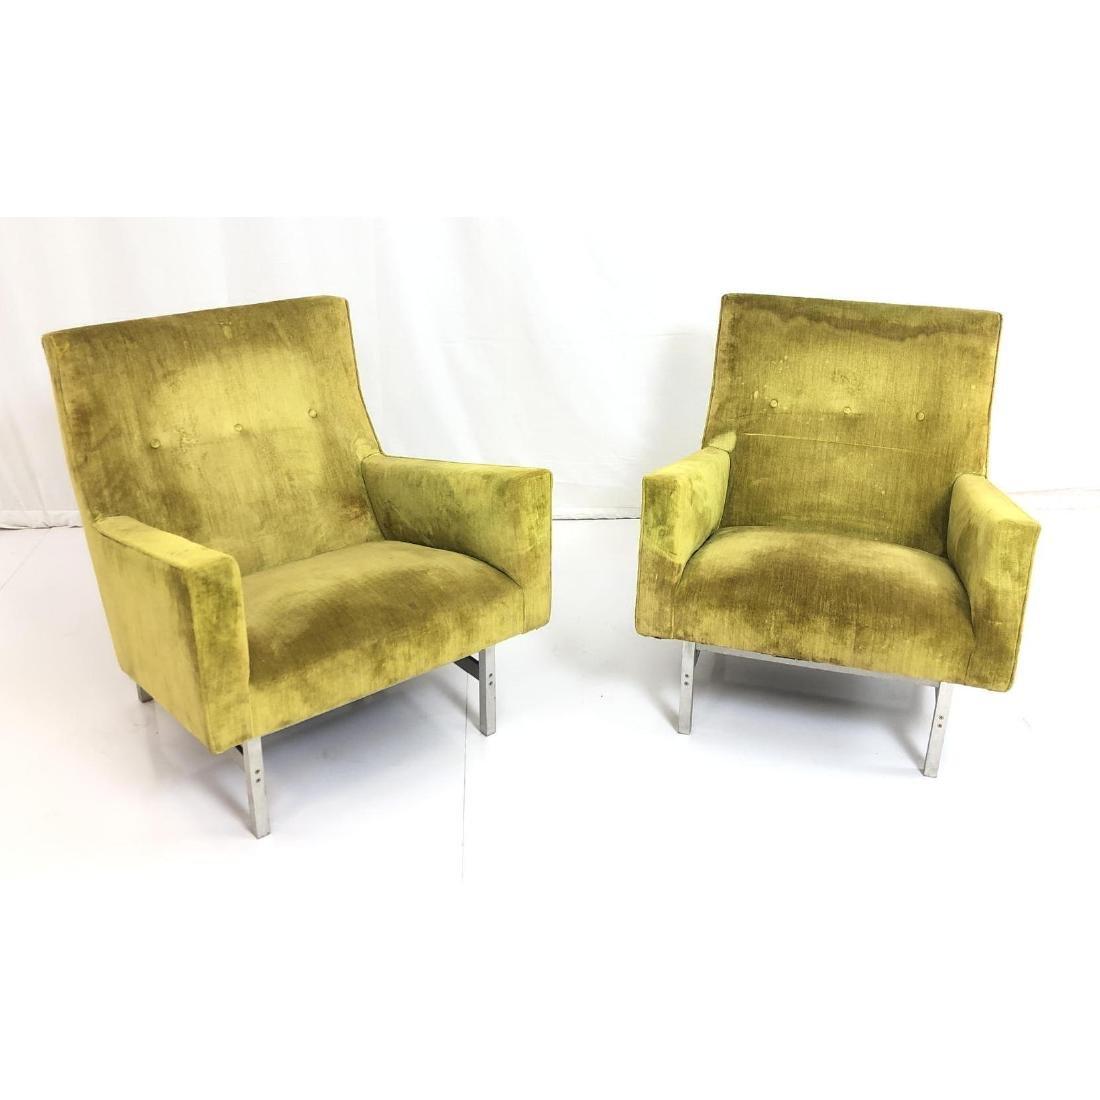 Pr JENS RISOM Modernist Lounge Chairs. Rare metal